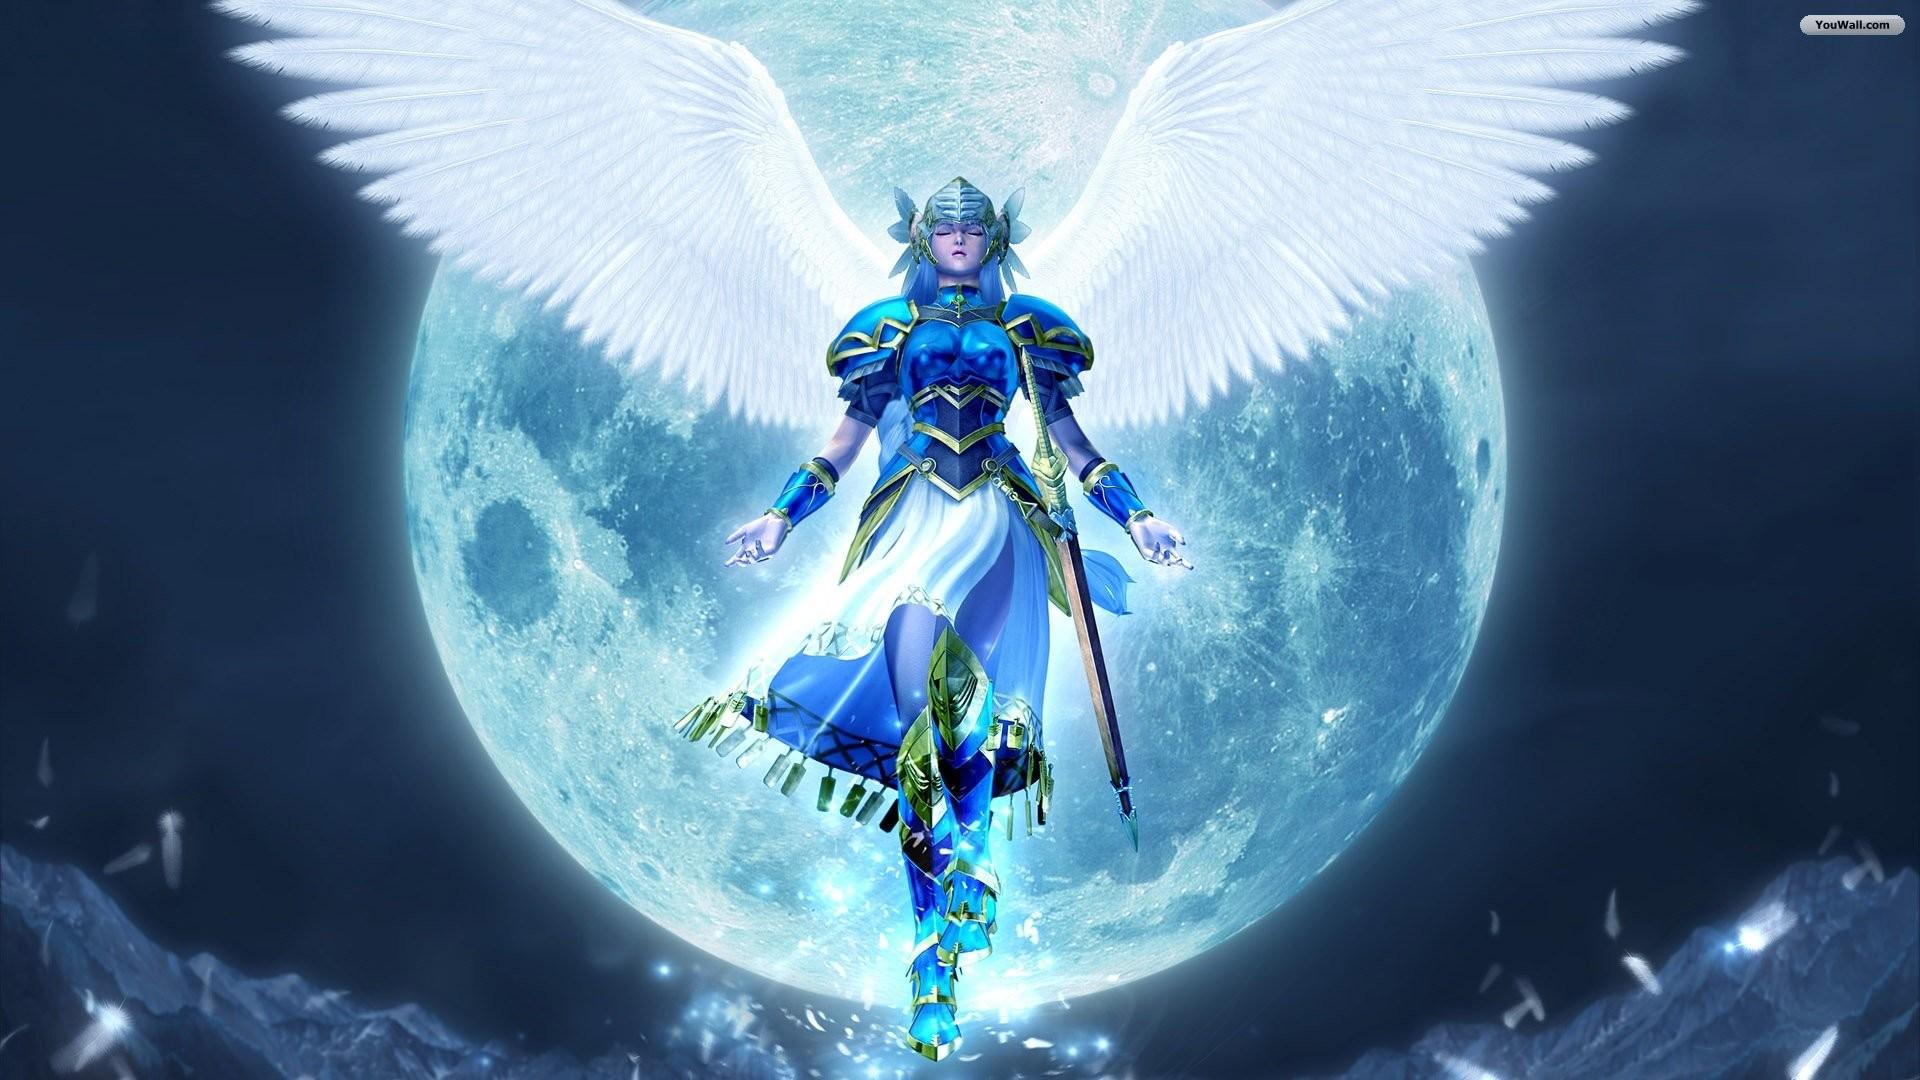 Final Fantasy Wallpaper – wallpaper,wallpapers,free wallpaper .